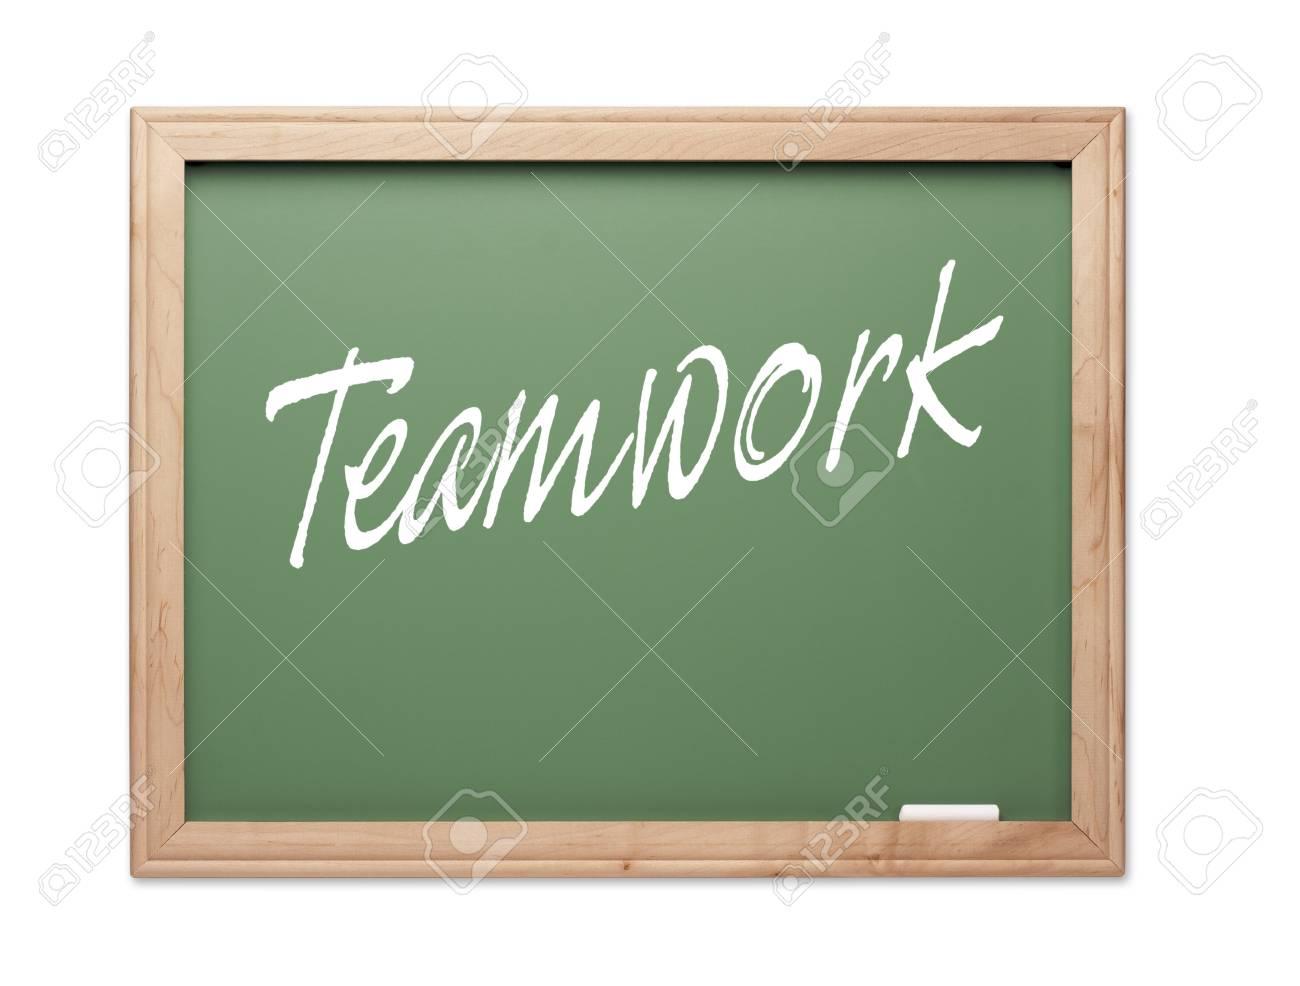 Teamwork Green Chalk Board Series on a White Background. Stock Photo - 10594897